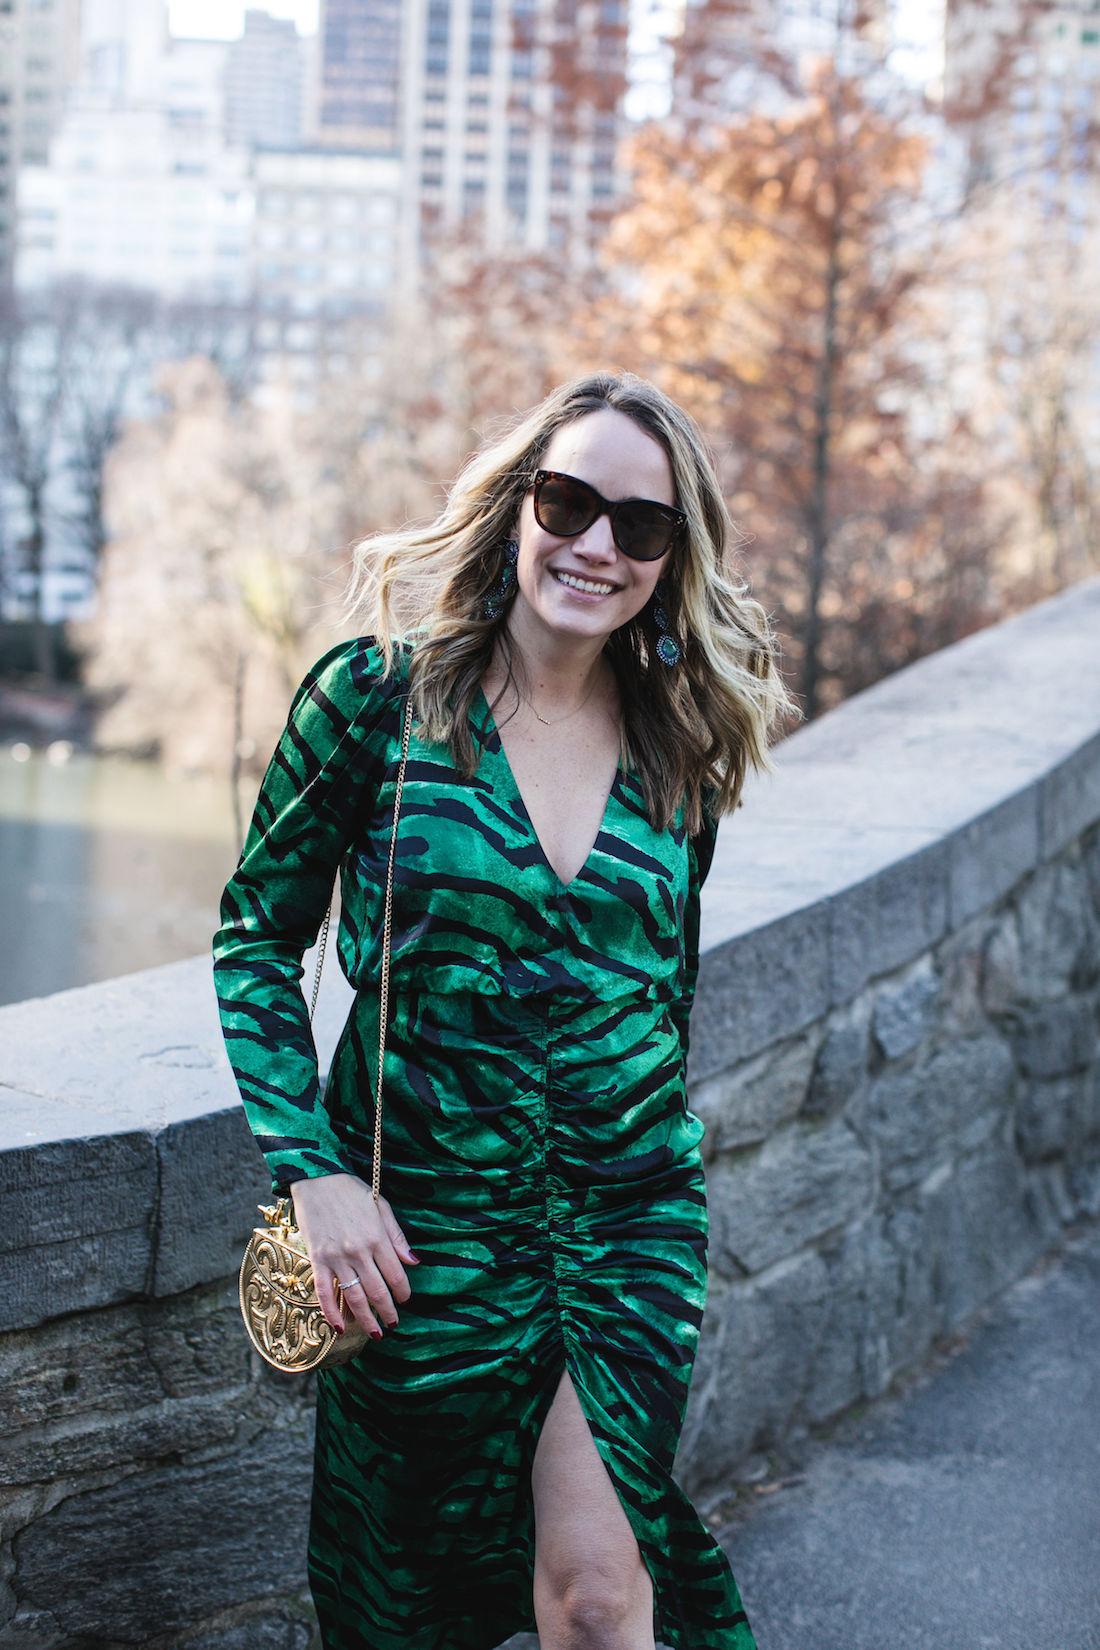 Outfit Details: Topshop Dress / Okhtein Bag // Kendra Scott Earrings // Polaroid Sunglasses